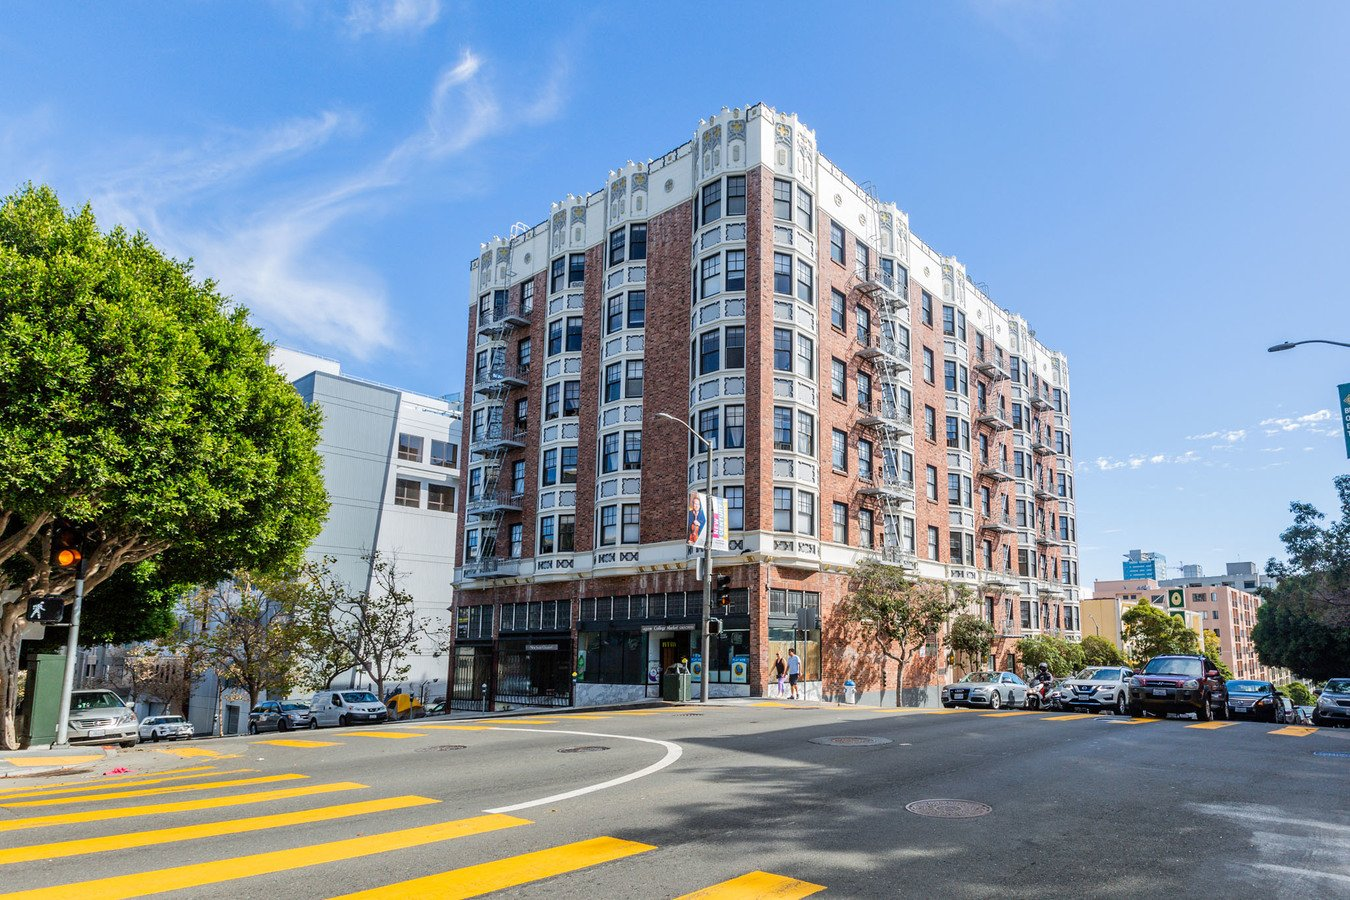 2 Bedrooms 1 Bathroom Apartment for rent at 950 Franklin Apartments in San Francisco, CA